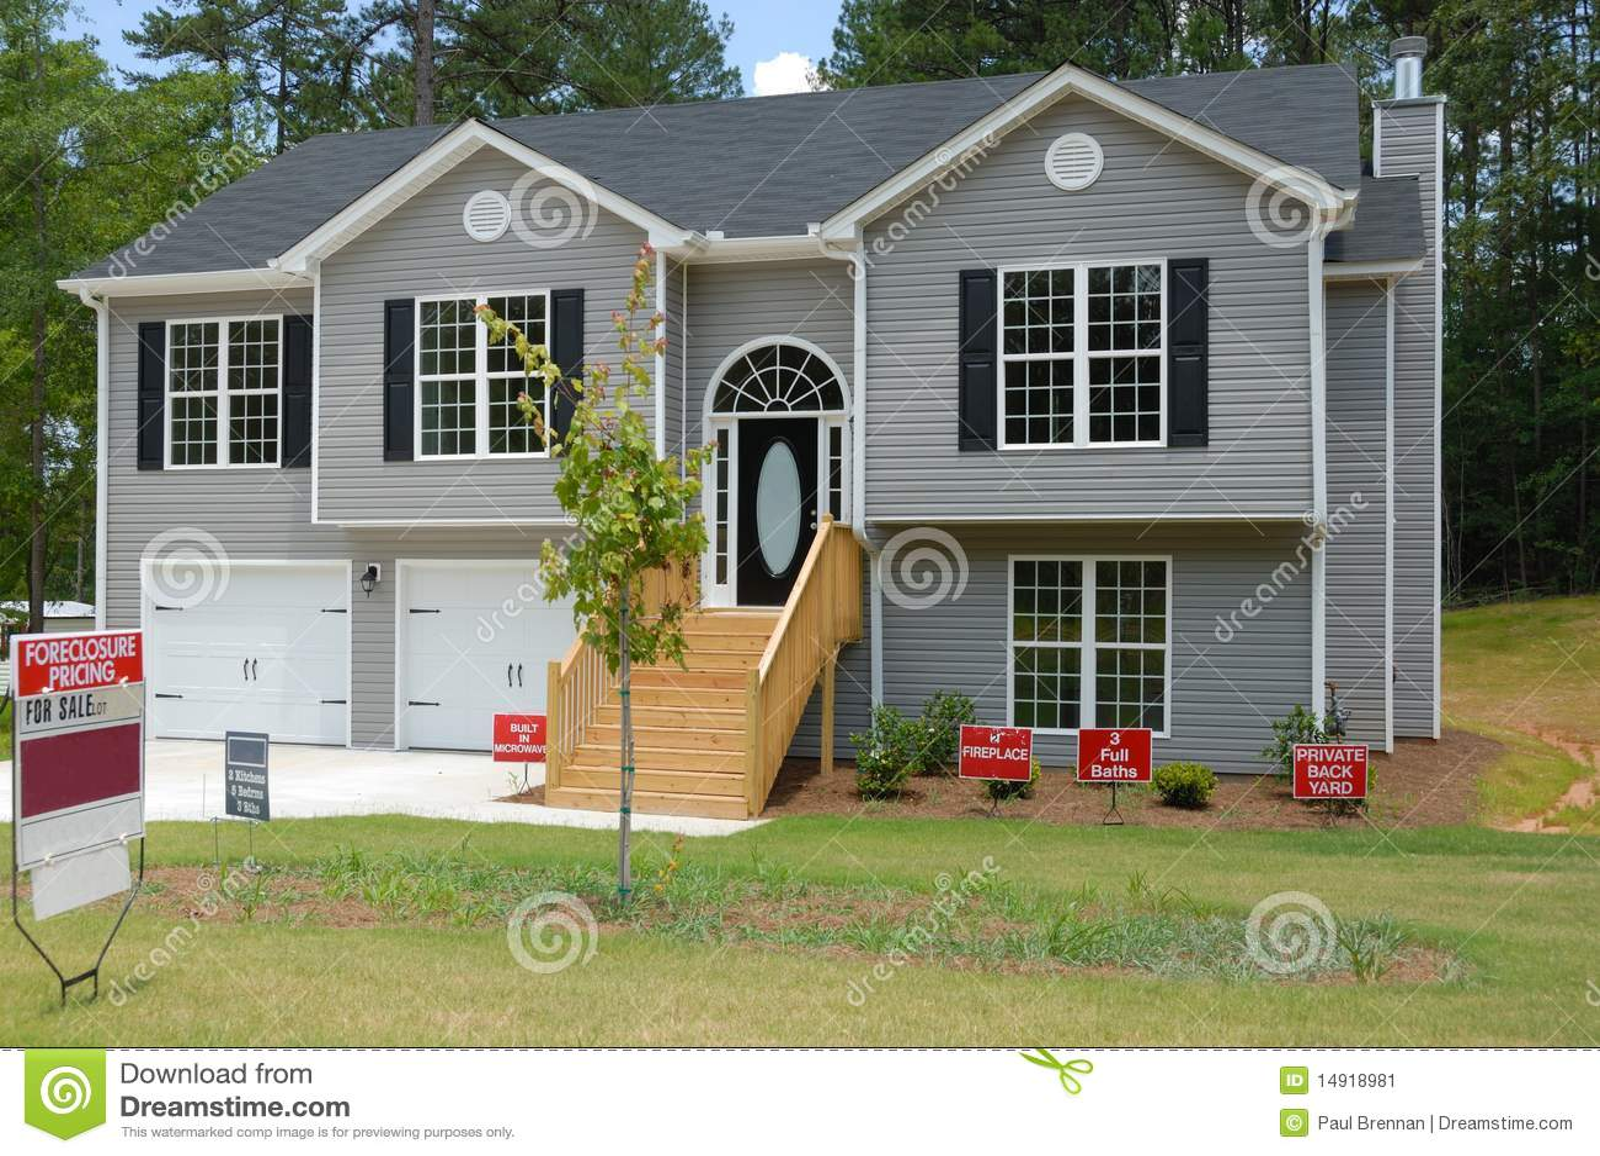 Split Level Home For Sale Stock Image Image 14918981